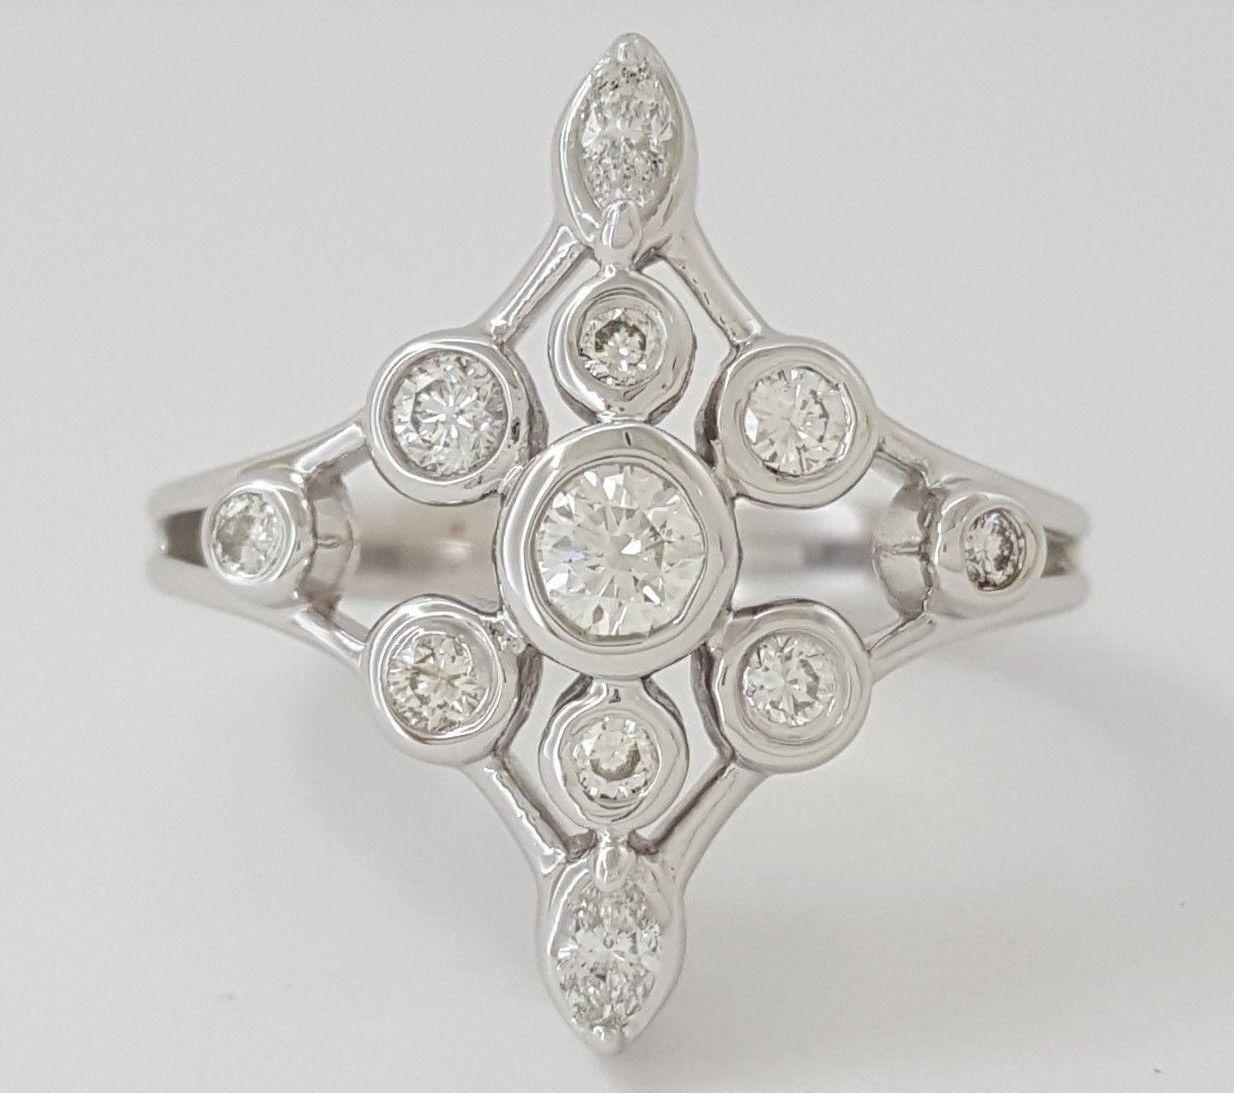 0.50 ct Vintage 14K White gold Round & Marquise Diamond Anniversary Fashion Ring